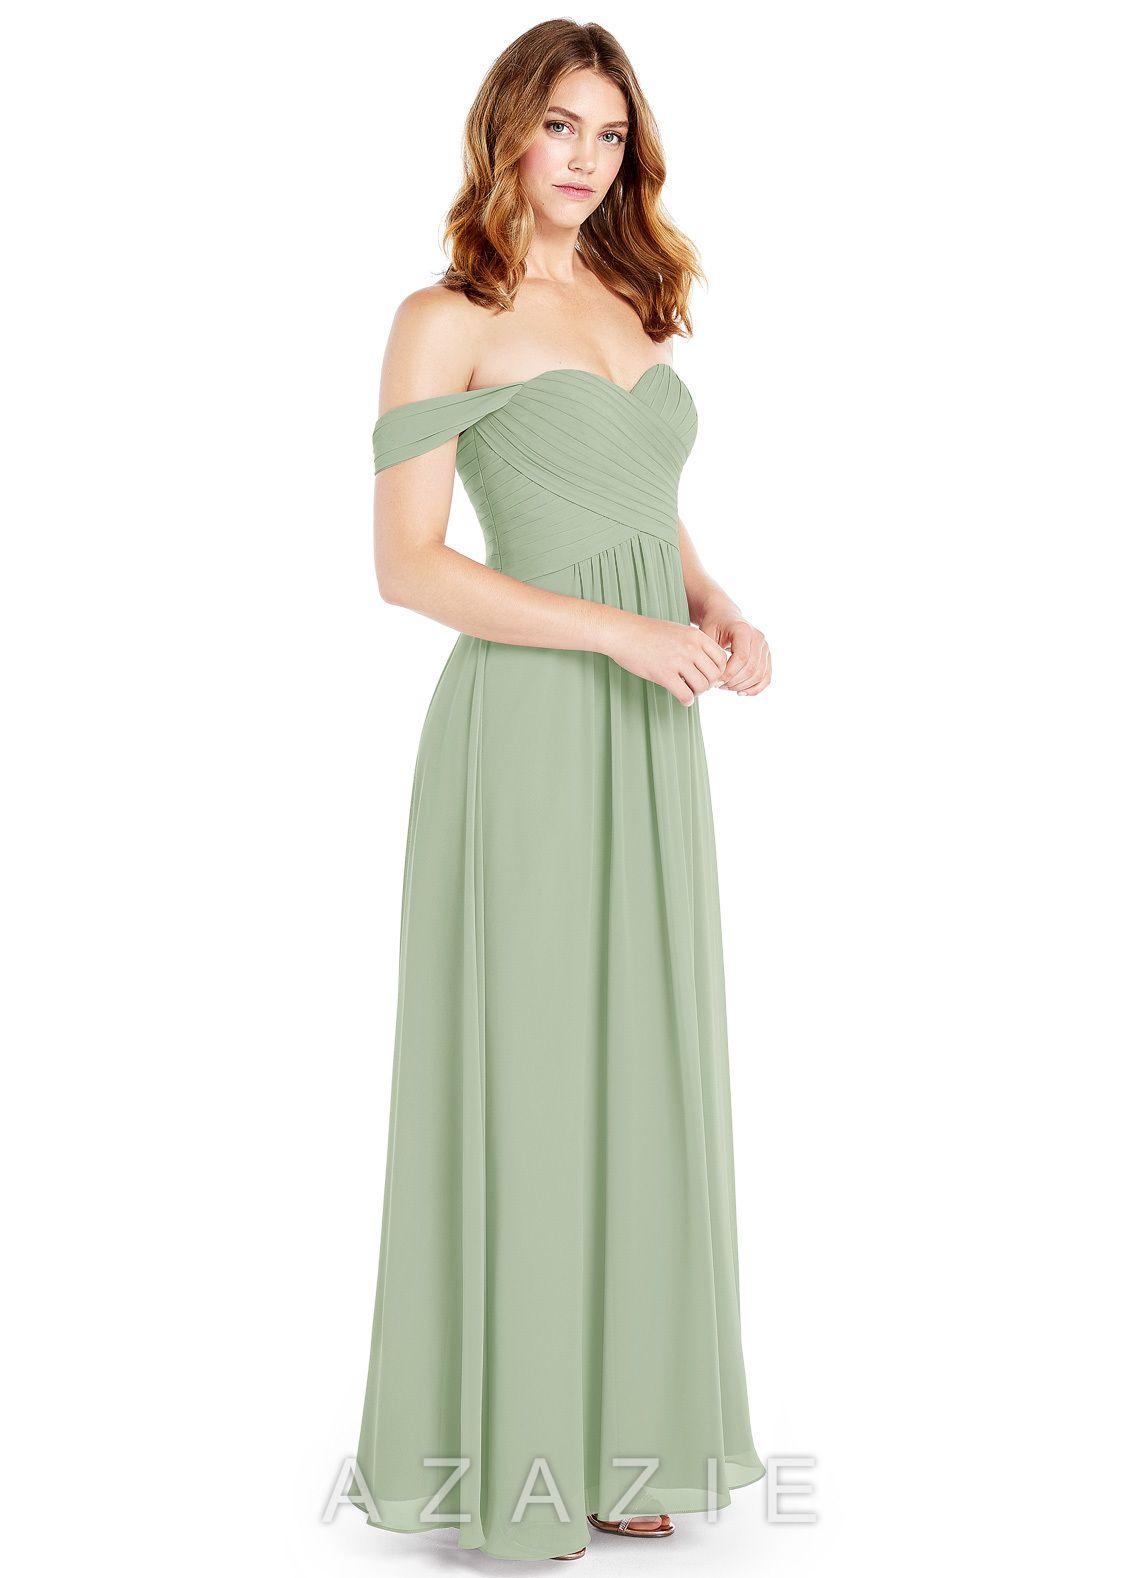 650c85b9807 Azazie Corin Bridesmaid Dress - Dusty Sage